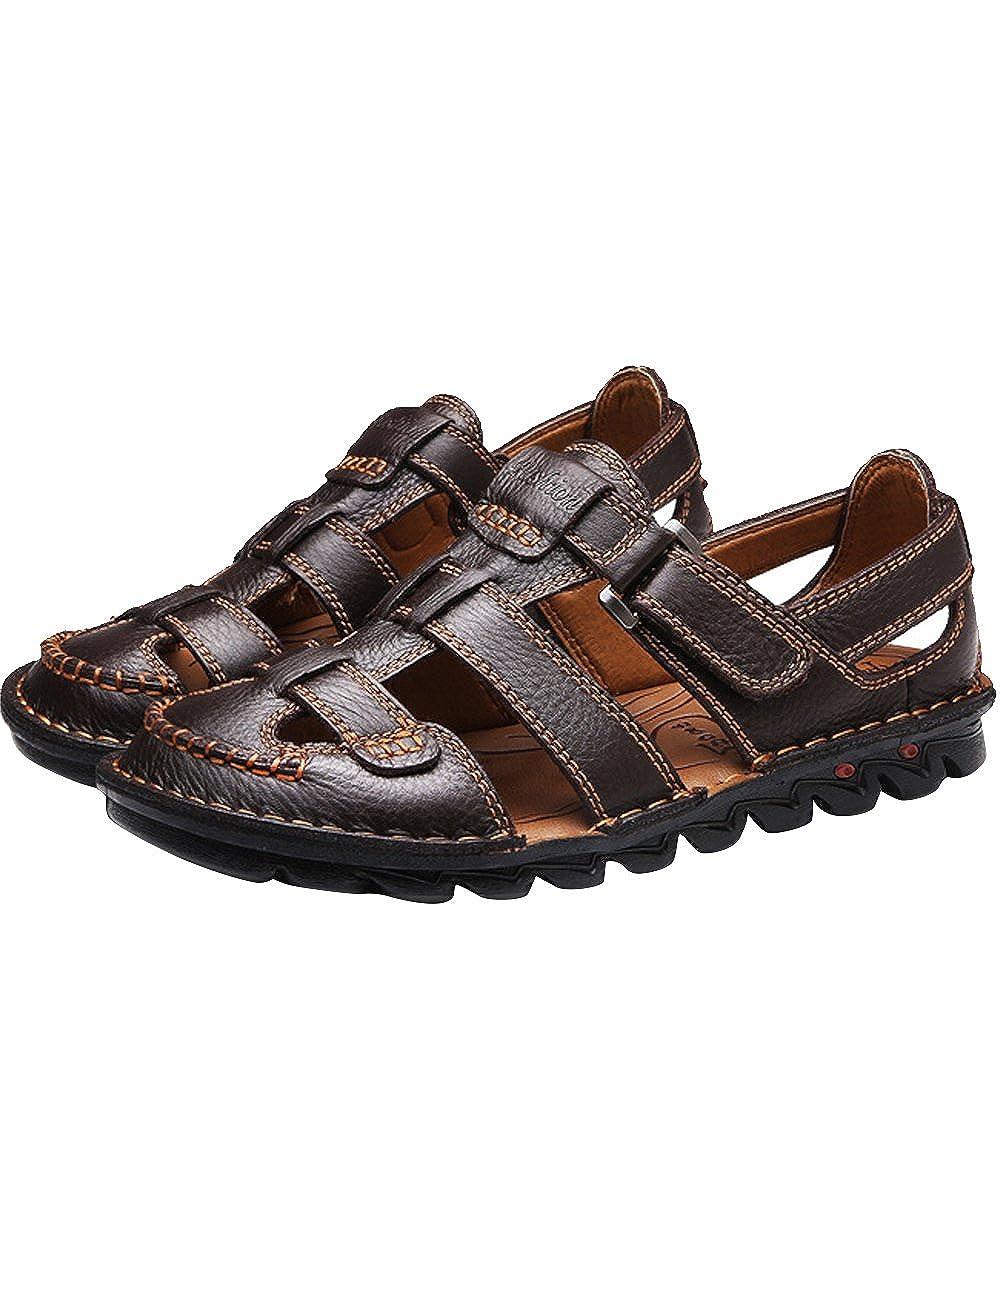 Herrenchwear Herren Leder Sport Sandalen Outdoor Wasserschuhe Schuhe Dunkel-braun-tx1322